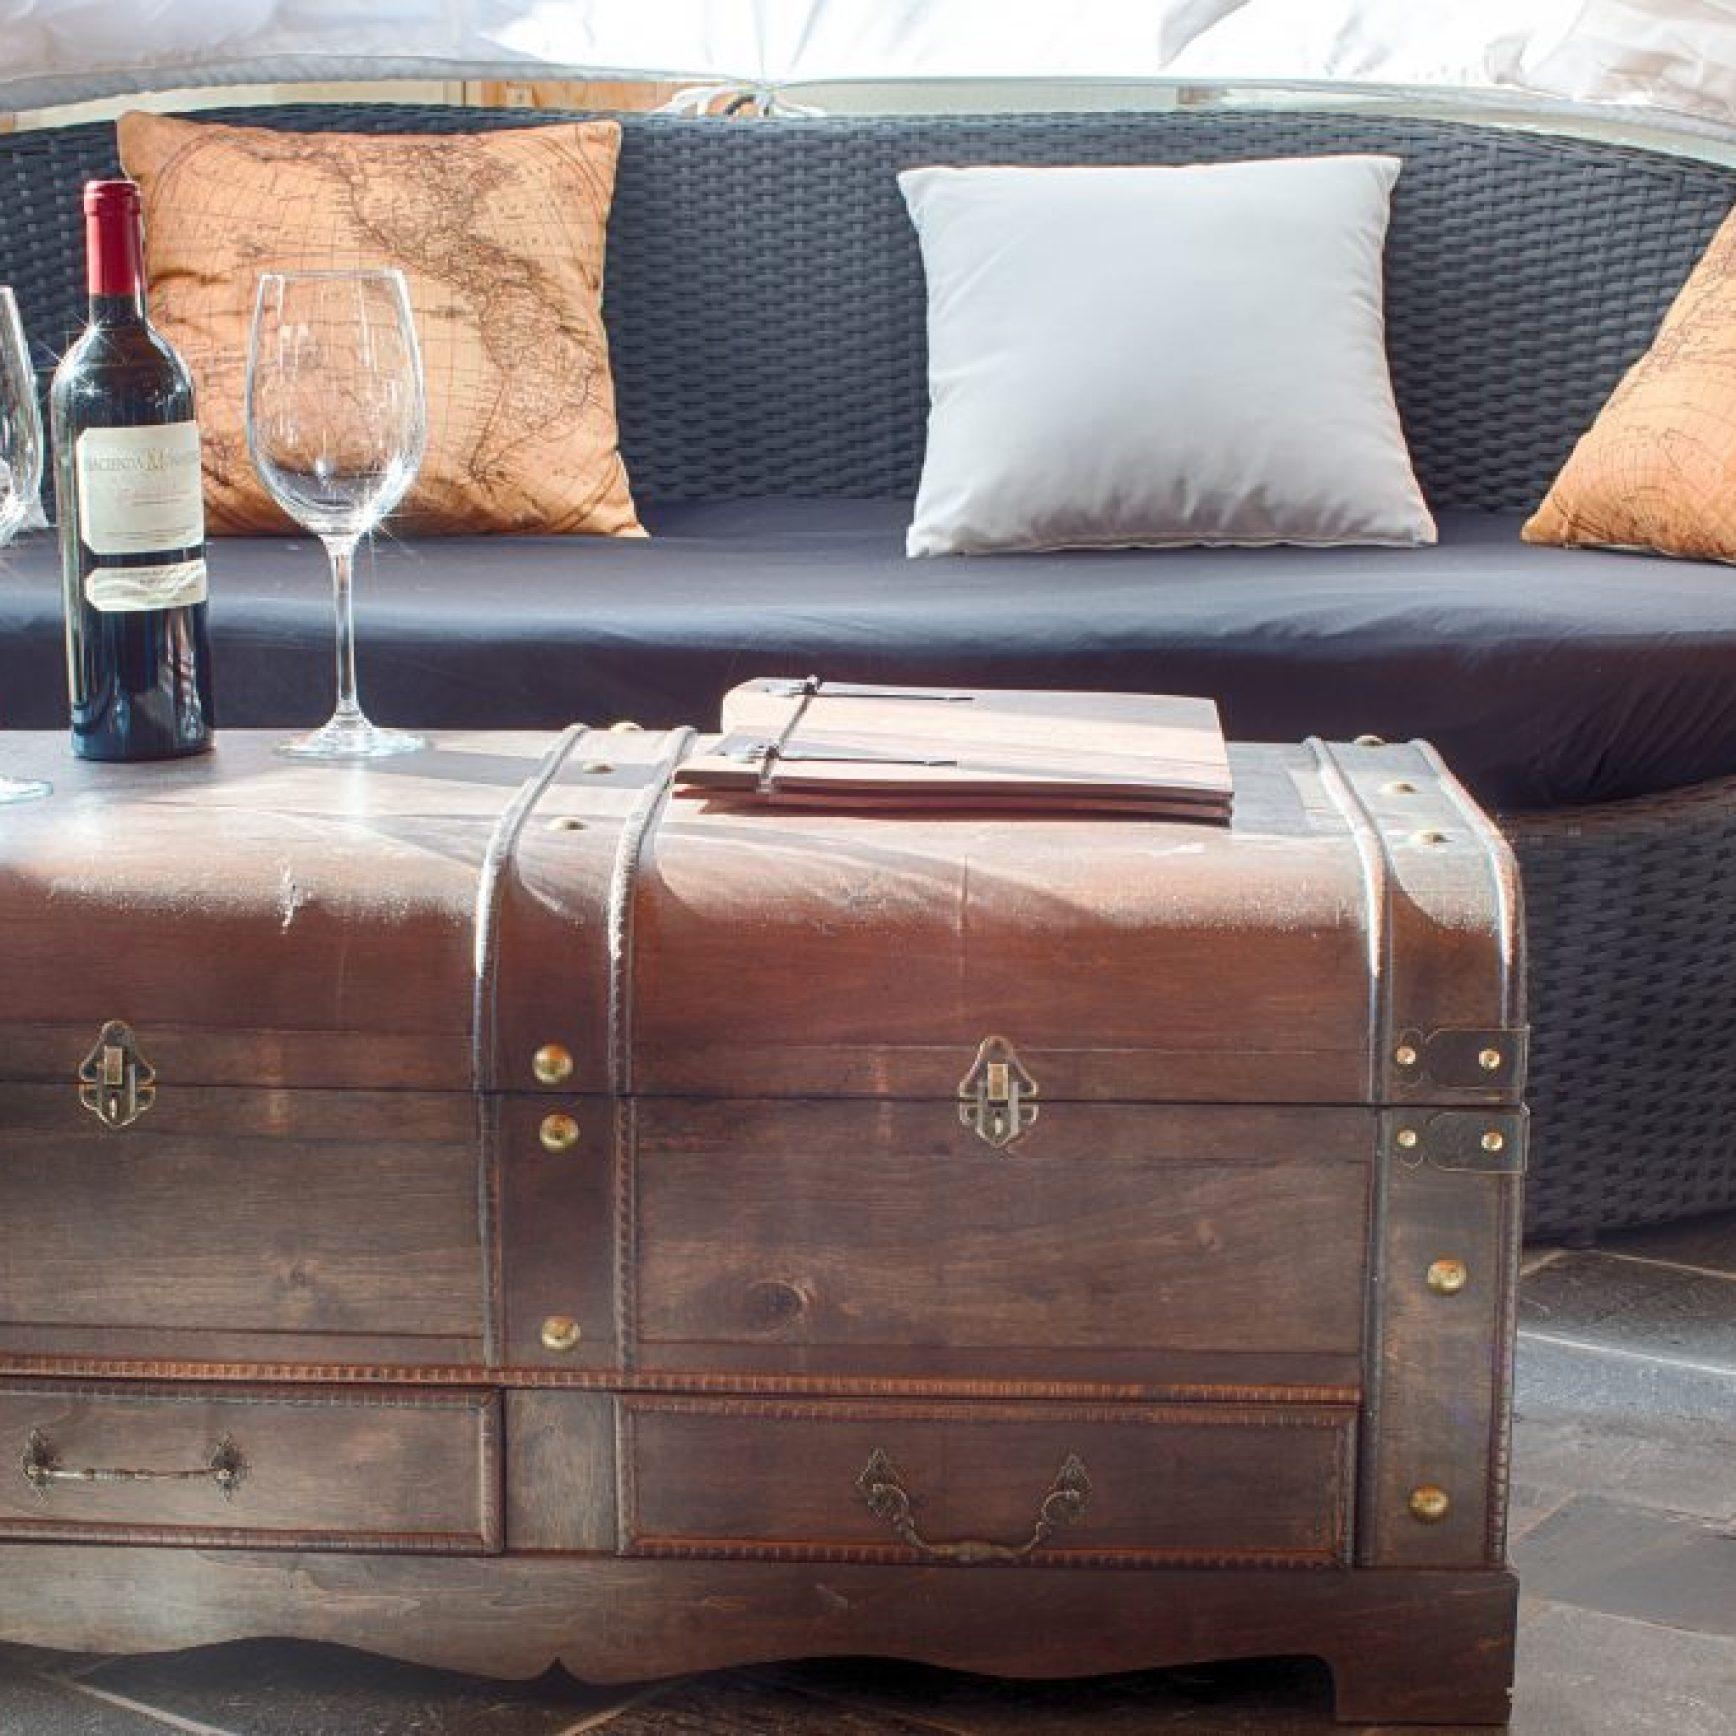 Picture Stylish Restatuant and Bar decor